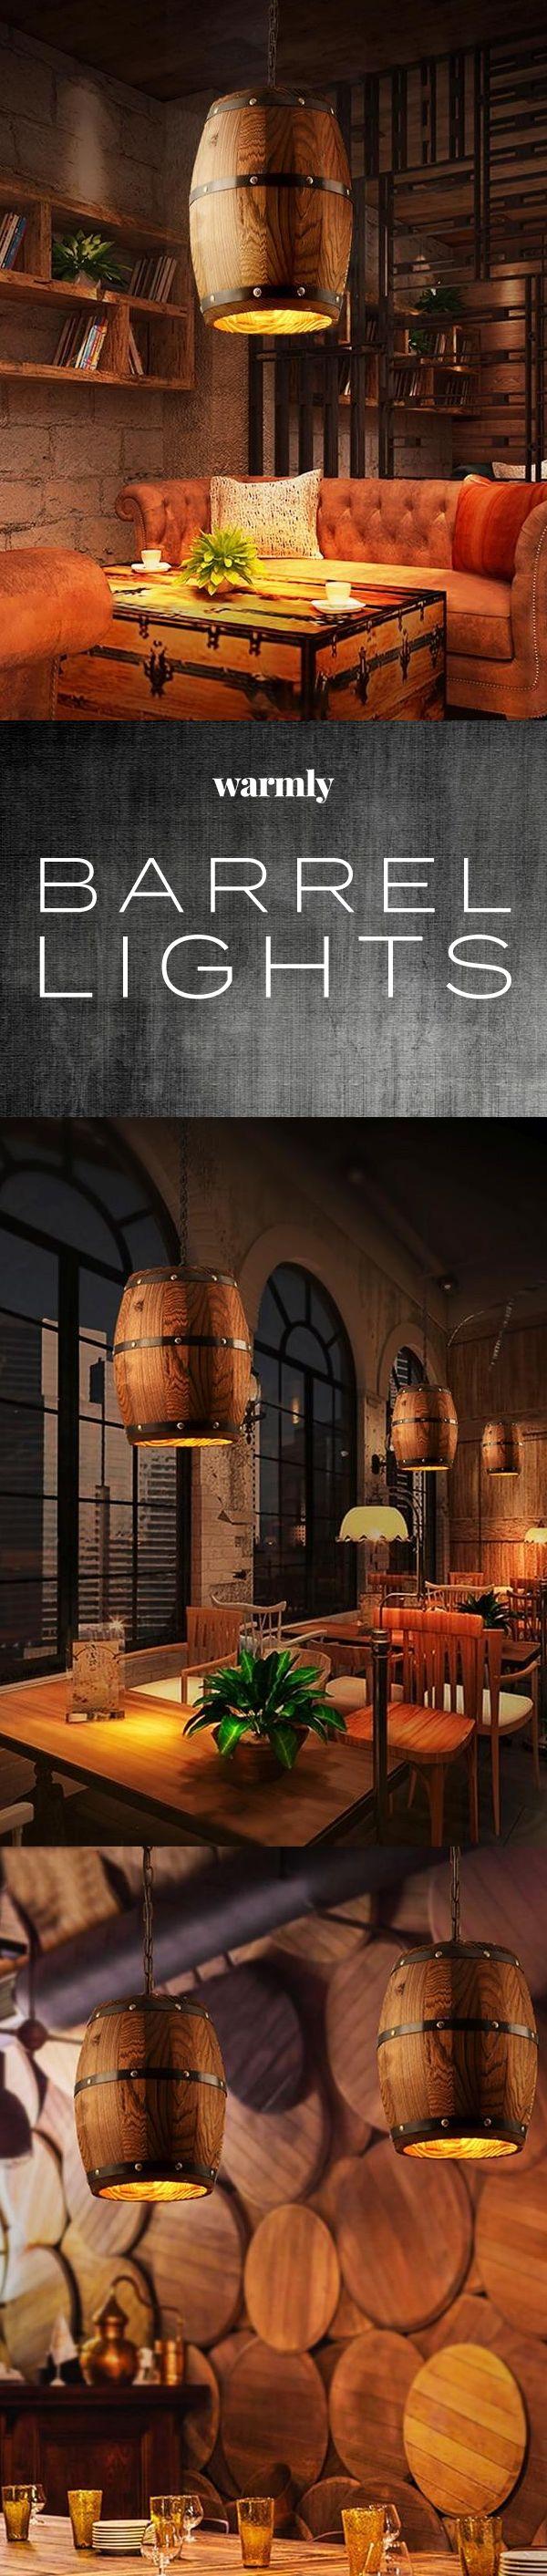 Erato – Hanging Wooden Wine Barrel Light